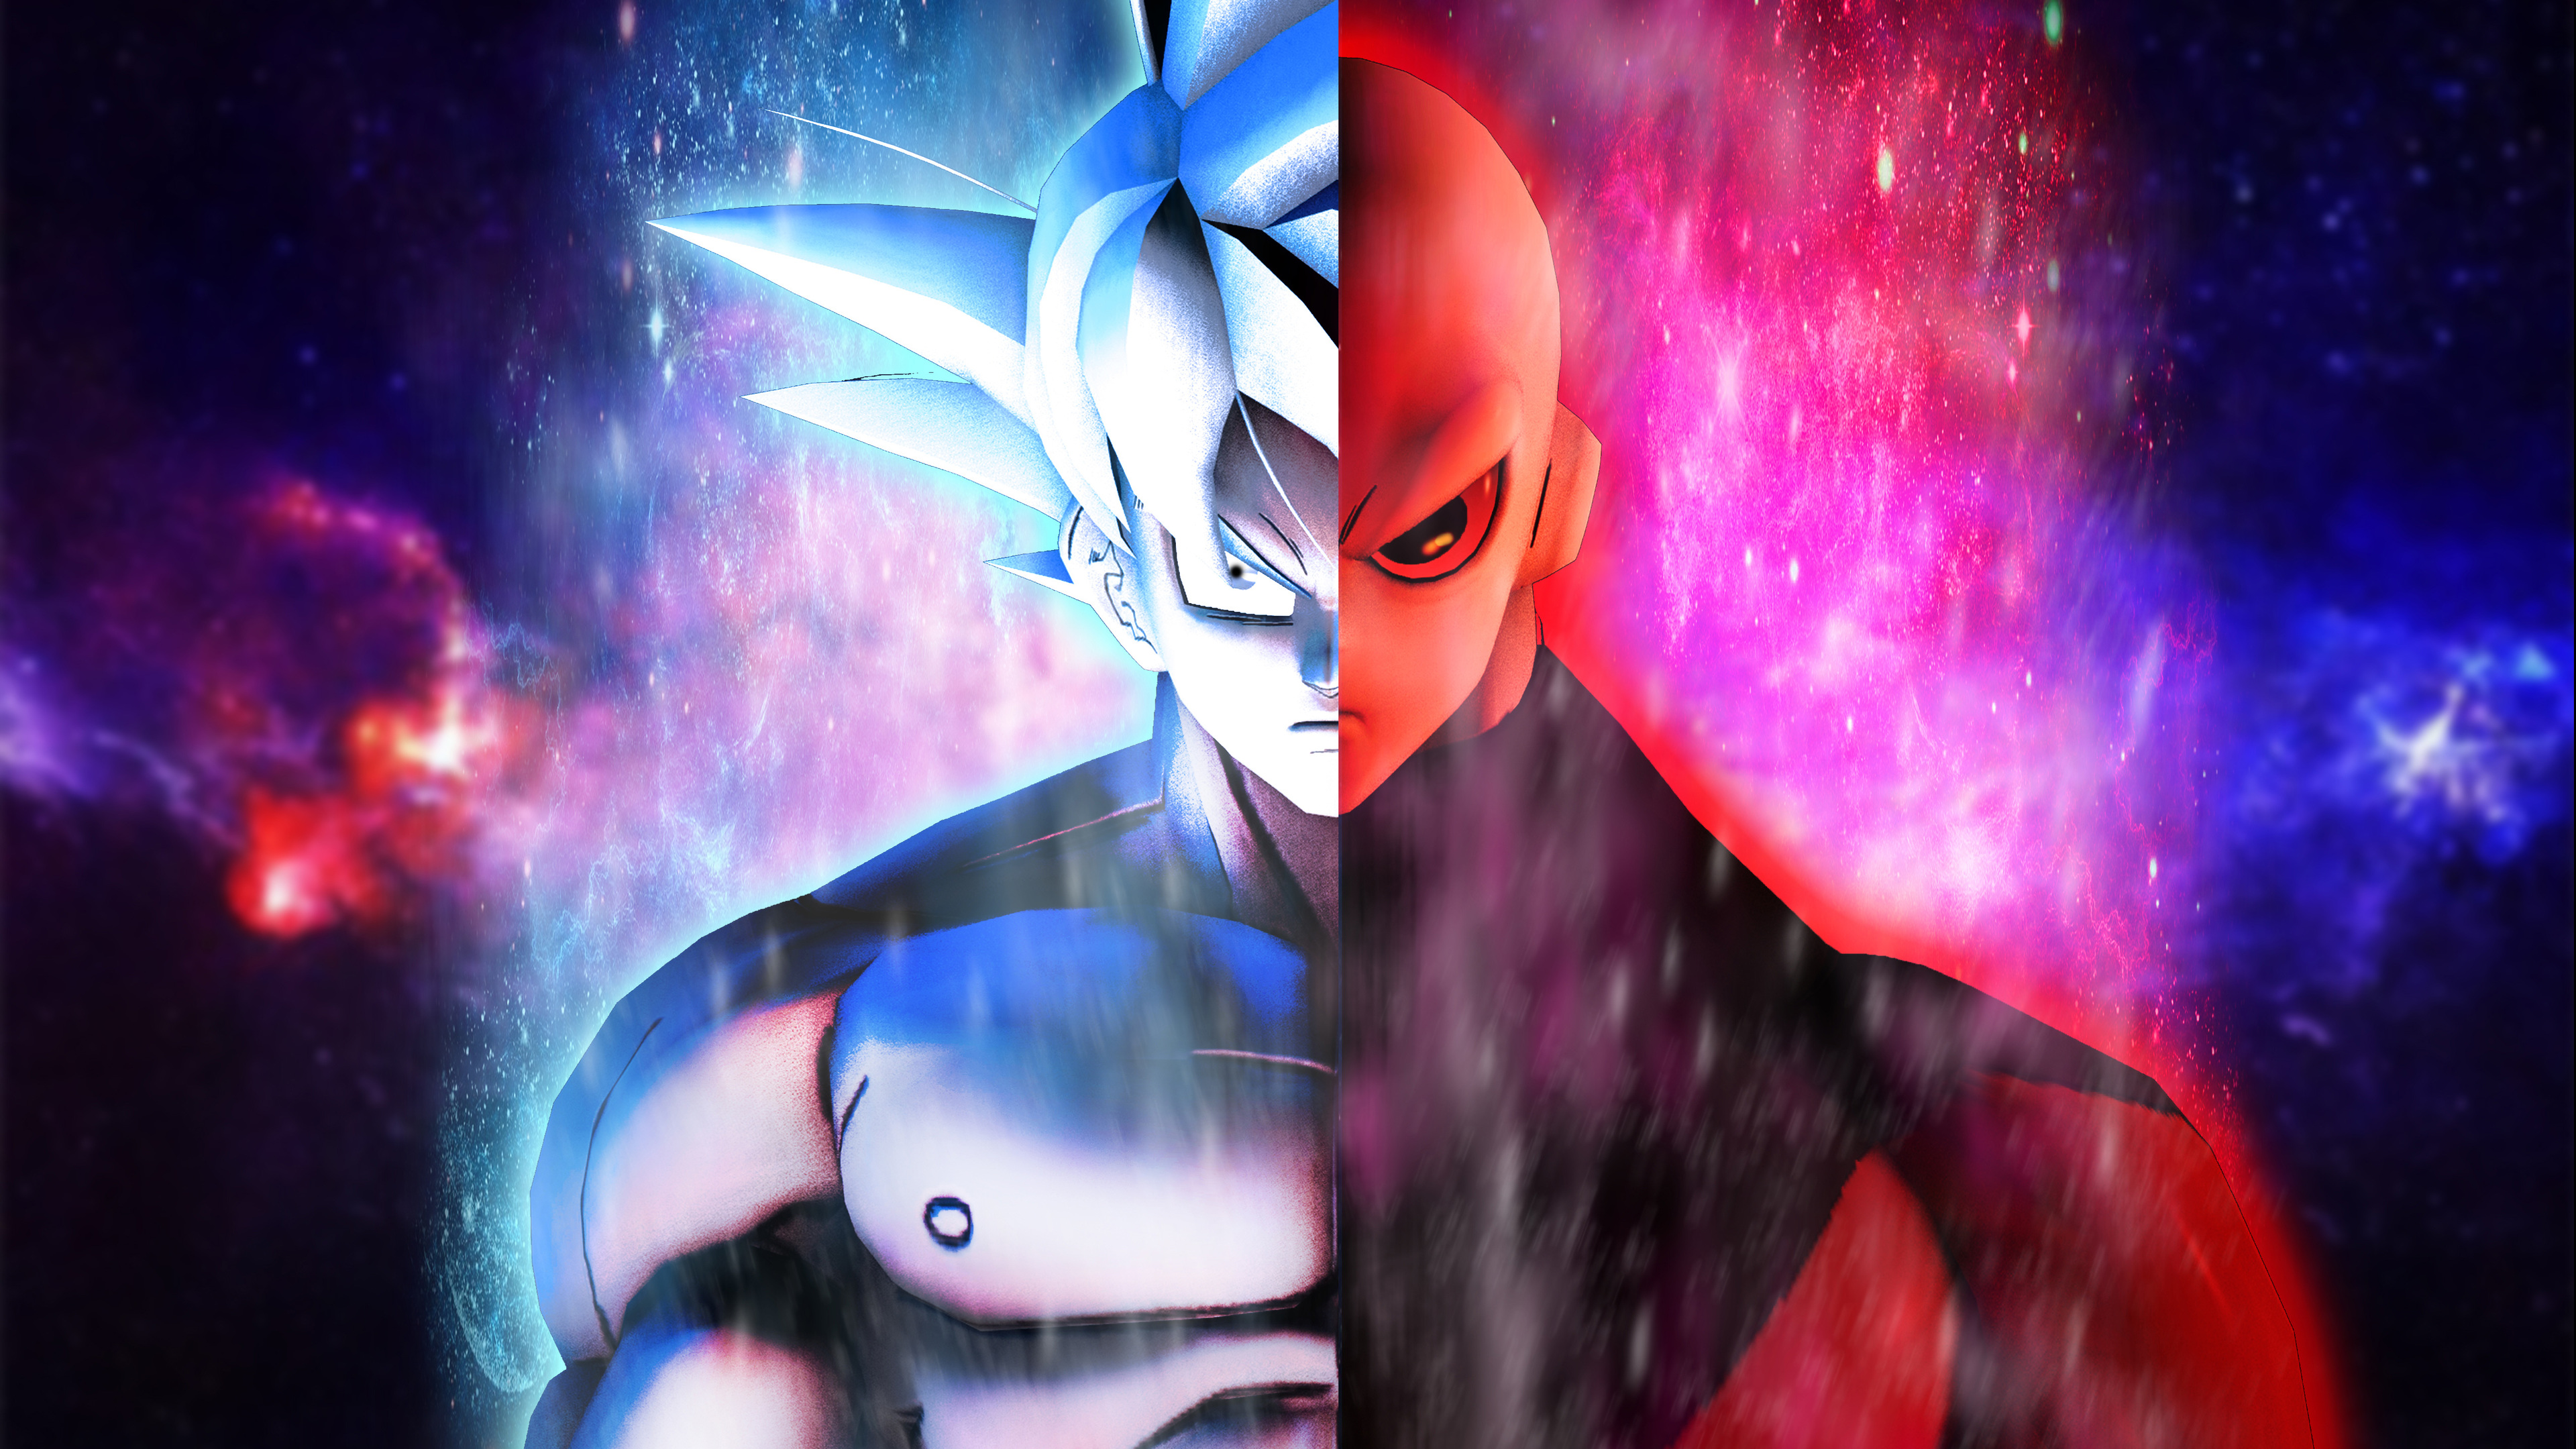 Wallpaper 4k Dragon Ball Super Goku Jire Ultra Instinct 3840x2160 Download Hd Wallpaper Wallpapertip